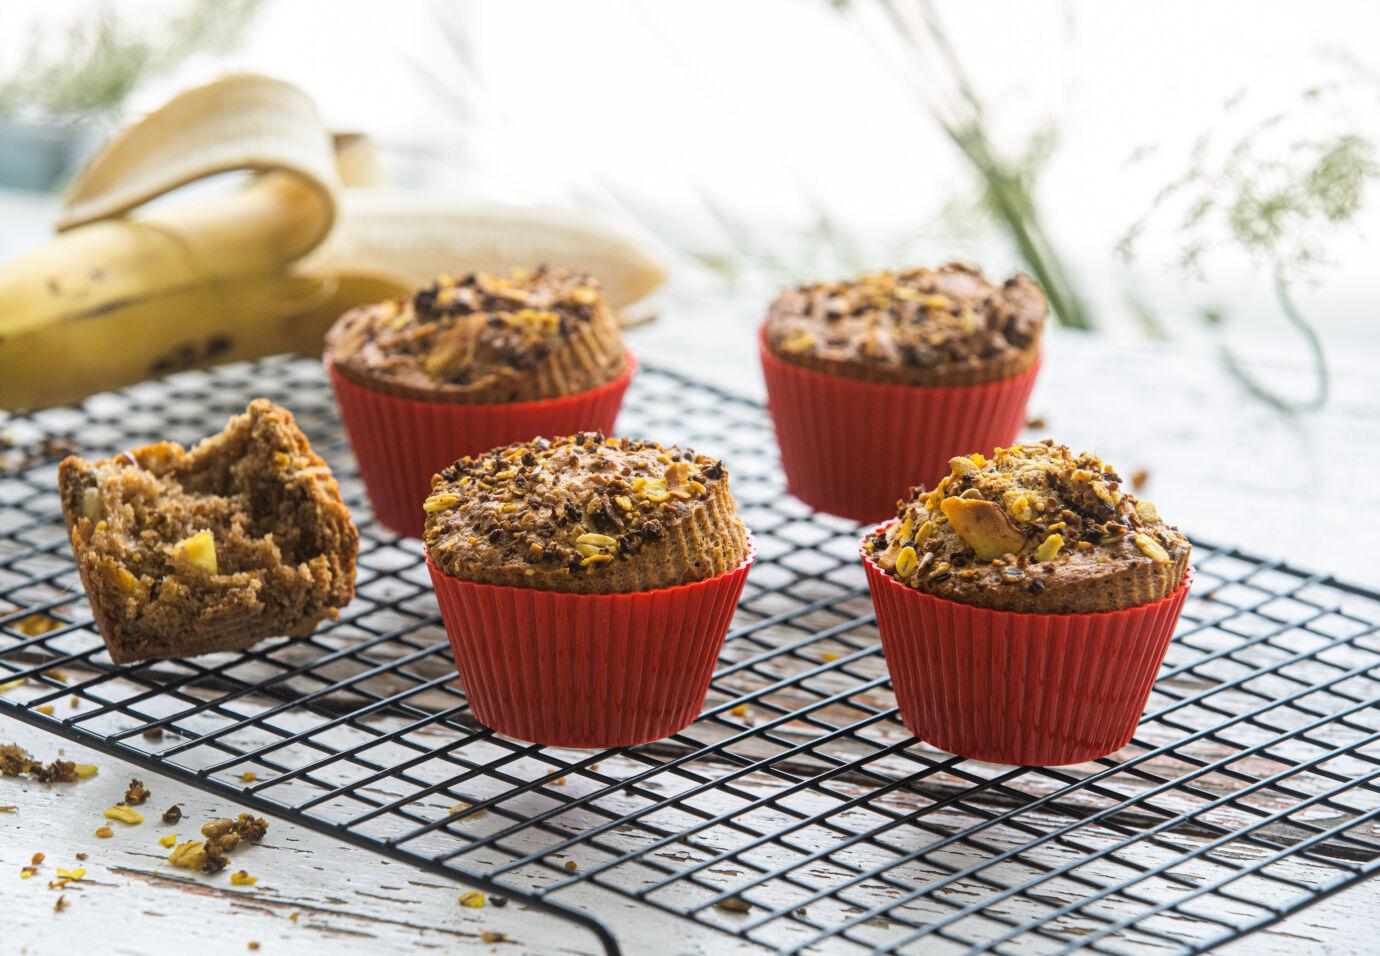 SOFIE DUMONT SEPT 2021 - Cupcakes bananen granola-2